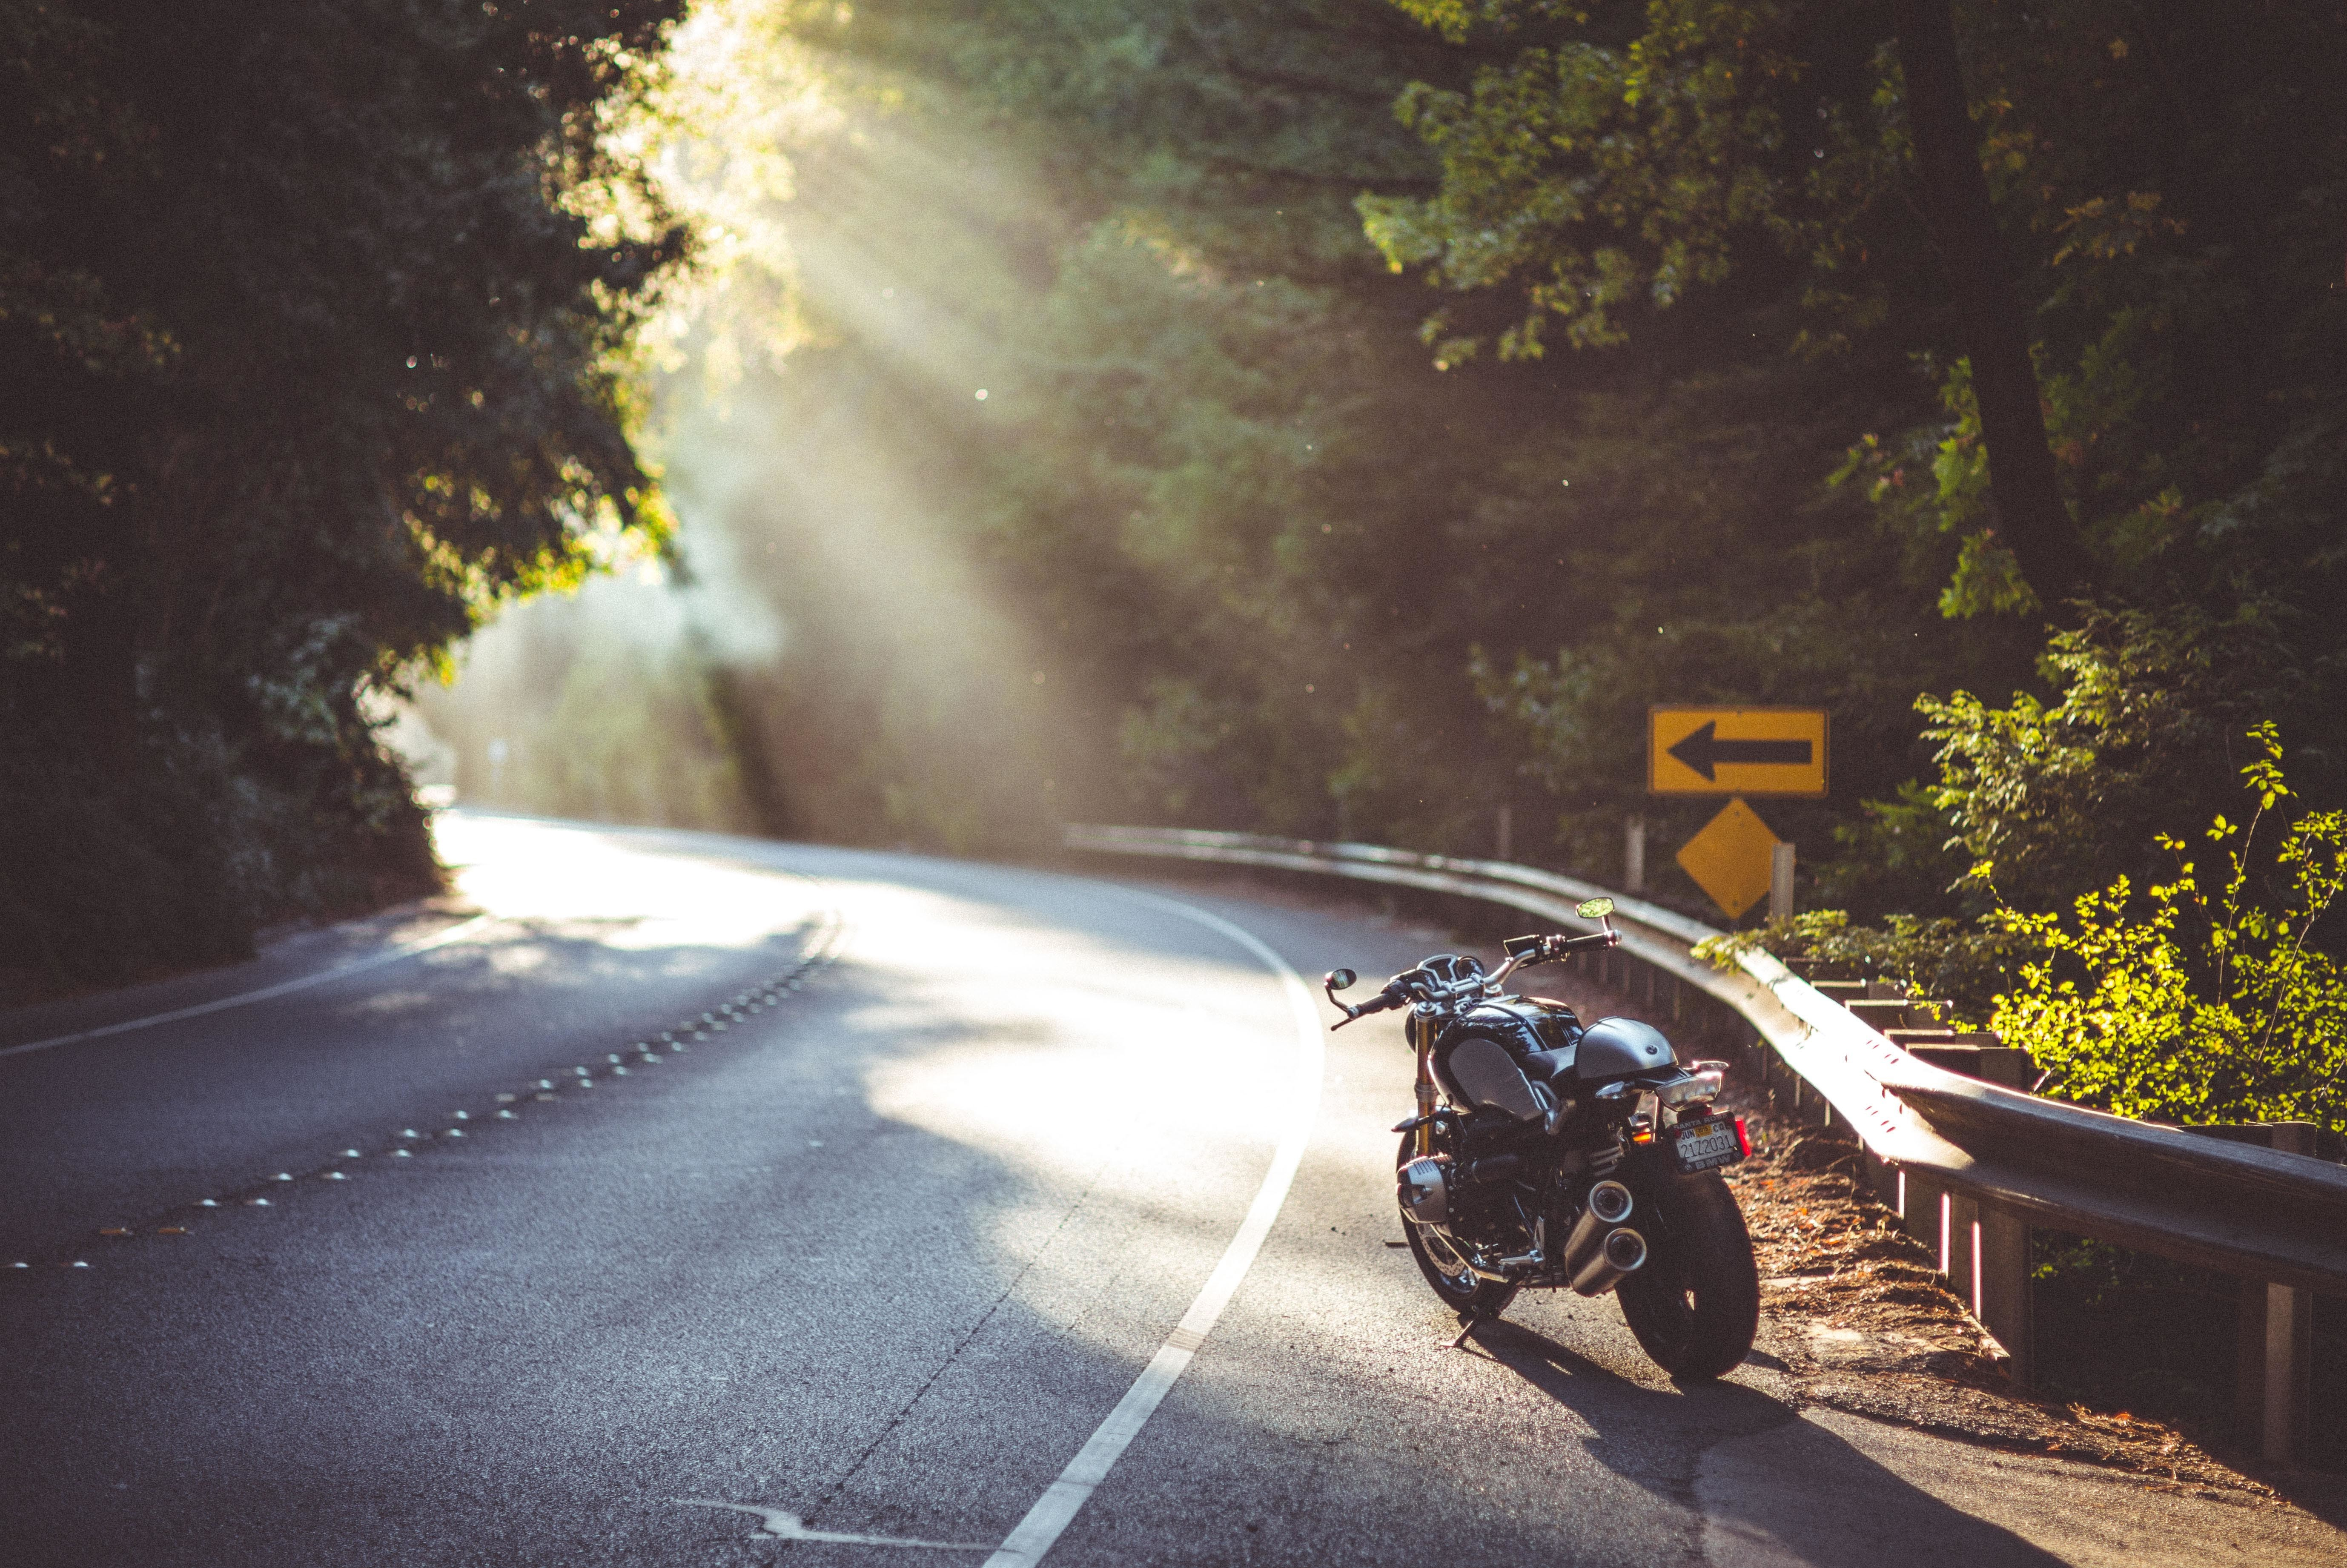 BMW R nineT 2016, HD Bikes, 4k Wallpapers, Images ...